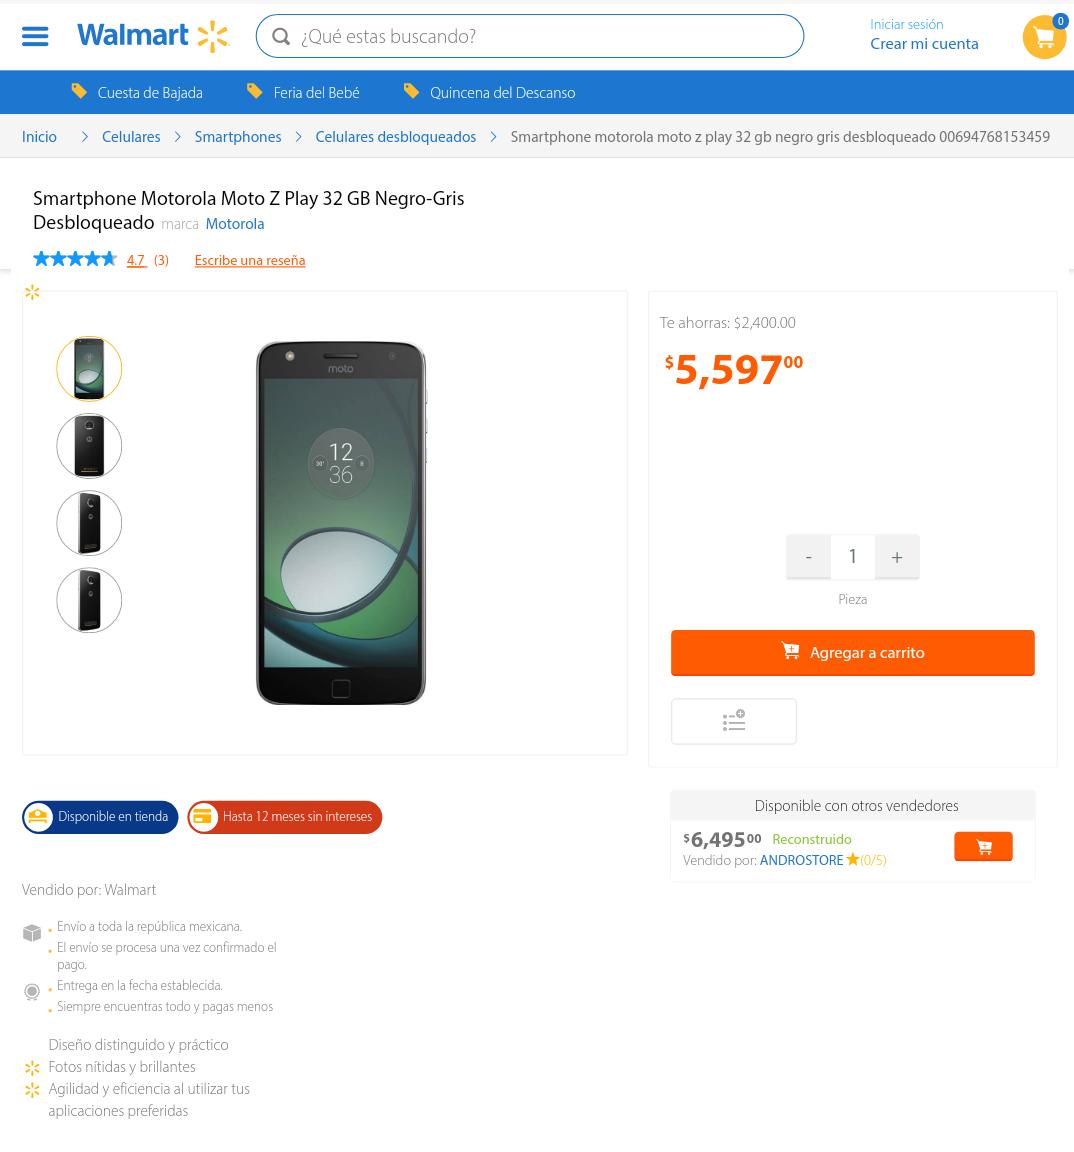 Walmart: Moto Z Play